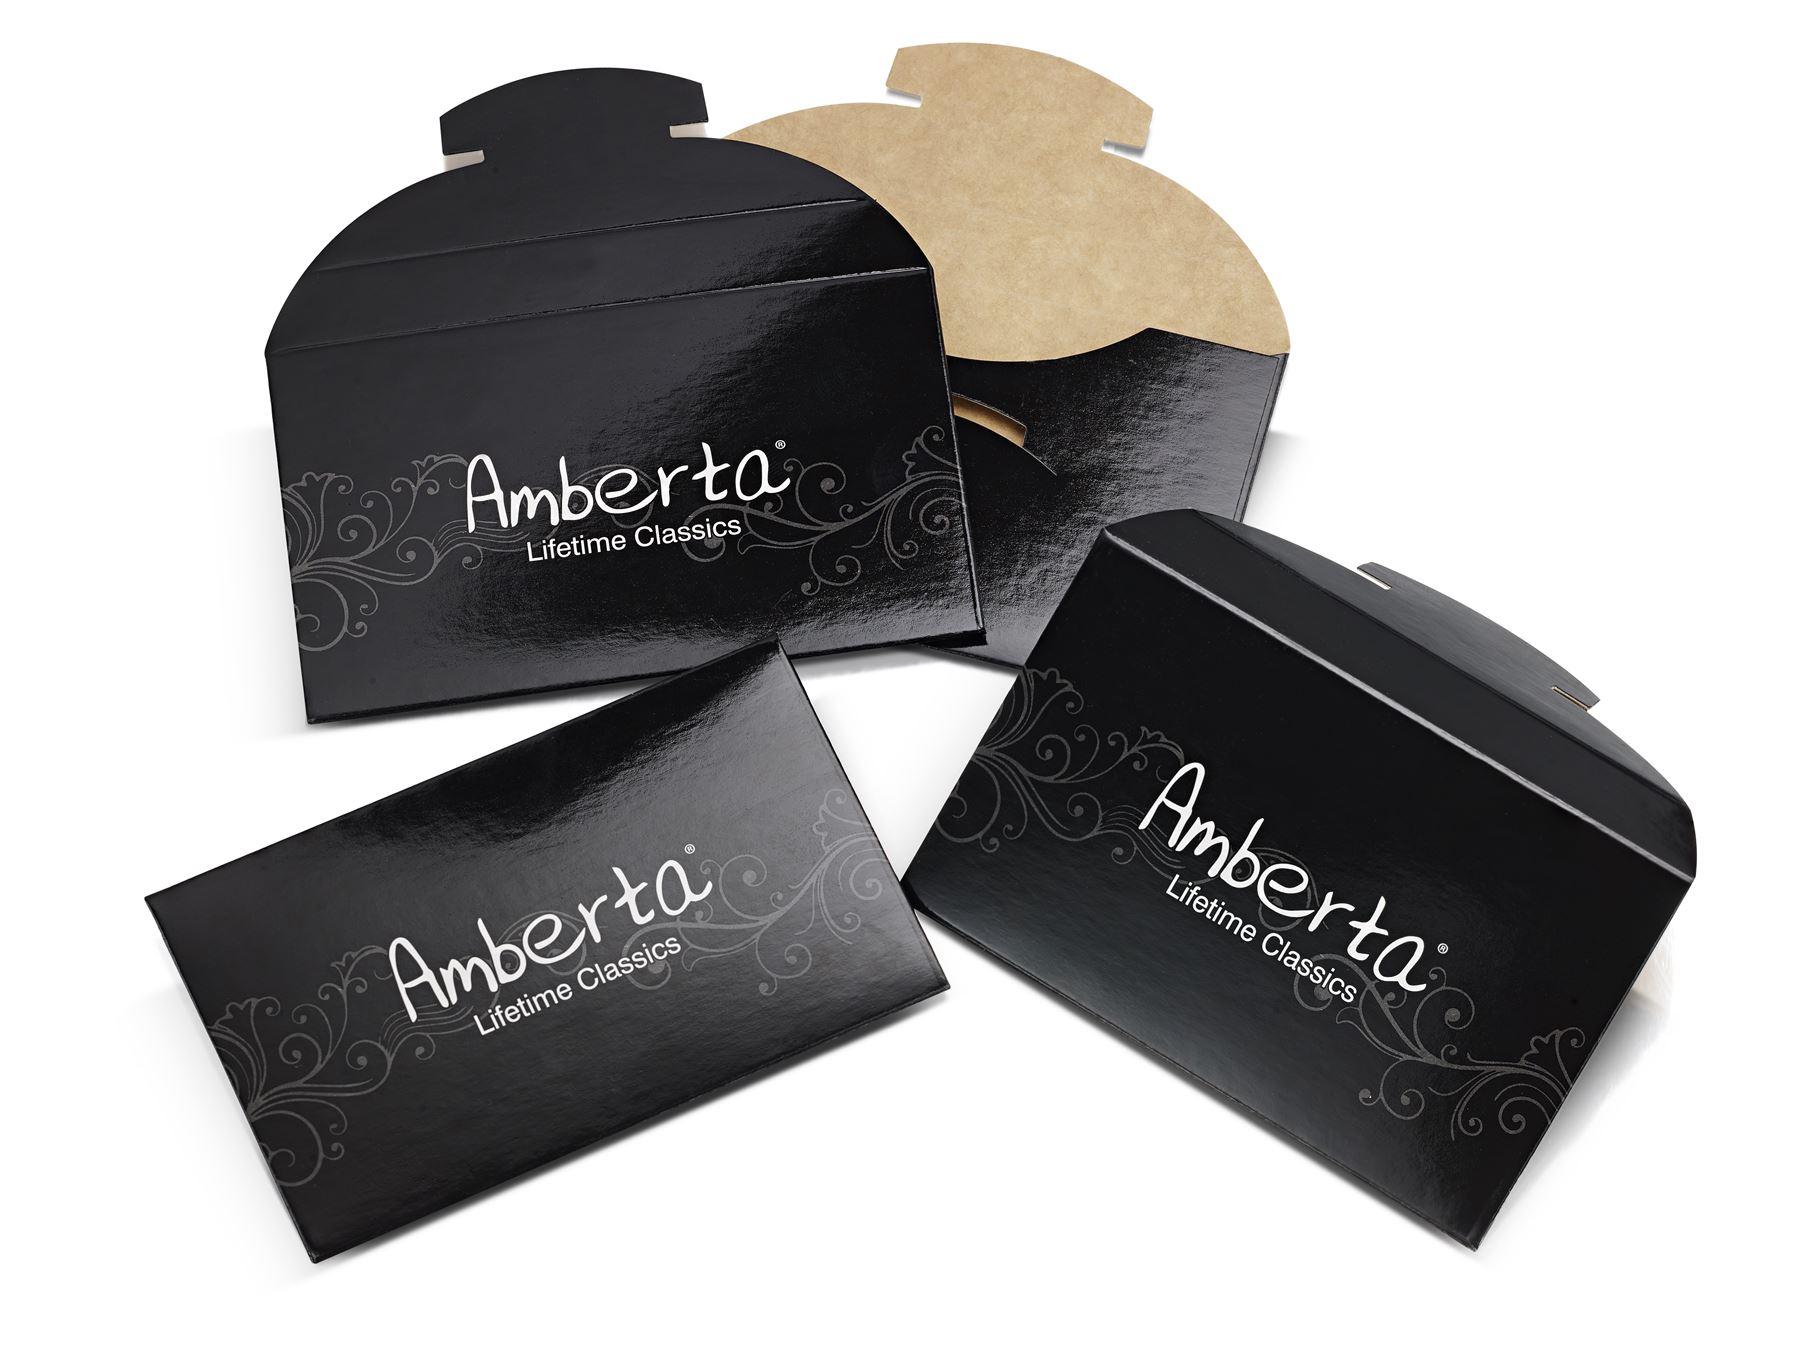 Amberta-Jewelry-925-Sterling-Silver-Adjustable-Bracelet-Italian-Bangle-for-Women miniature 52